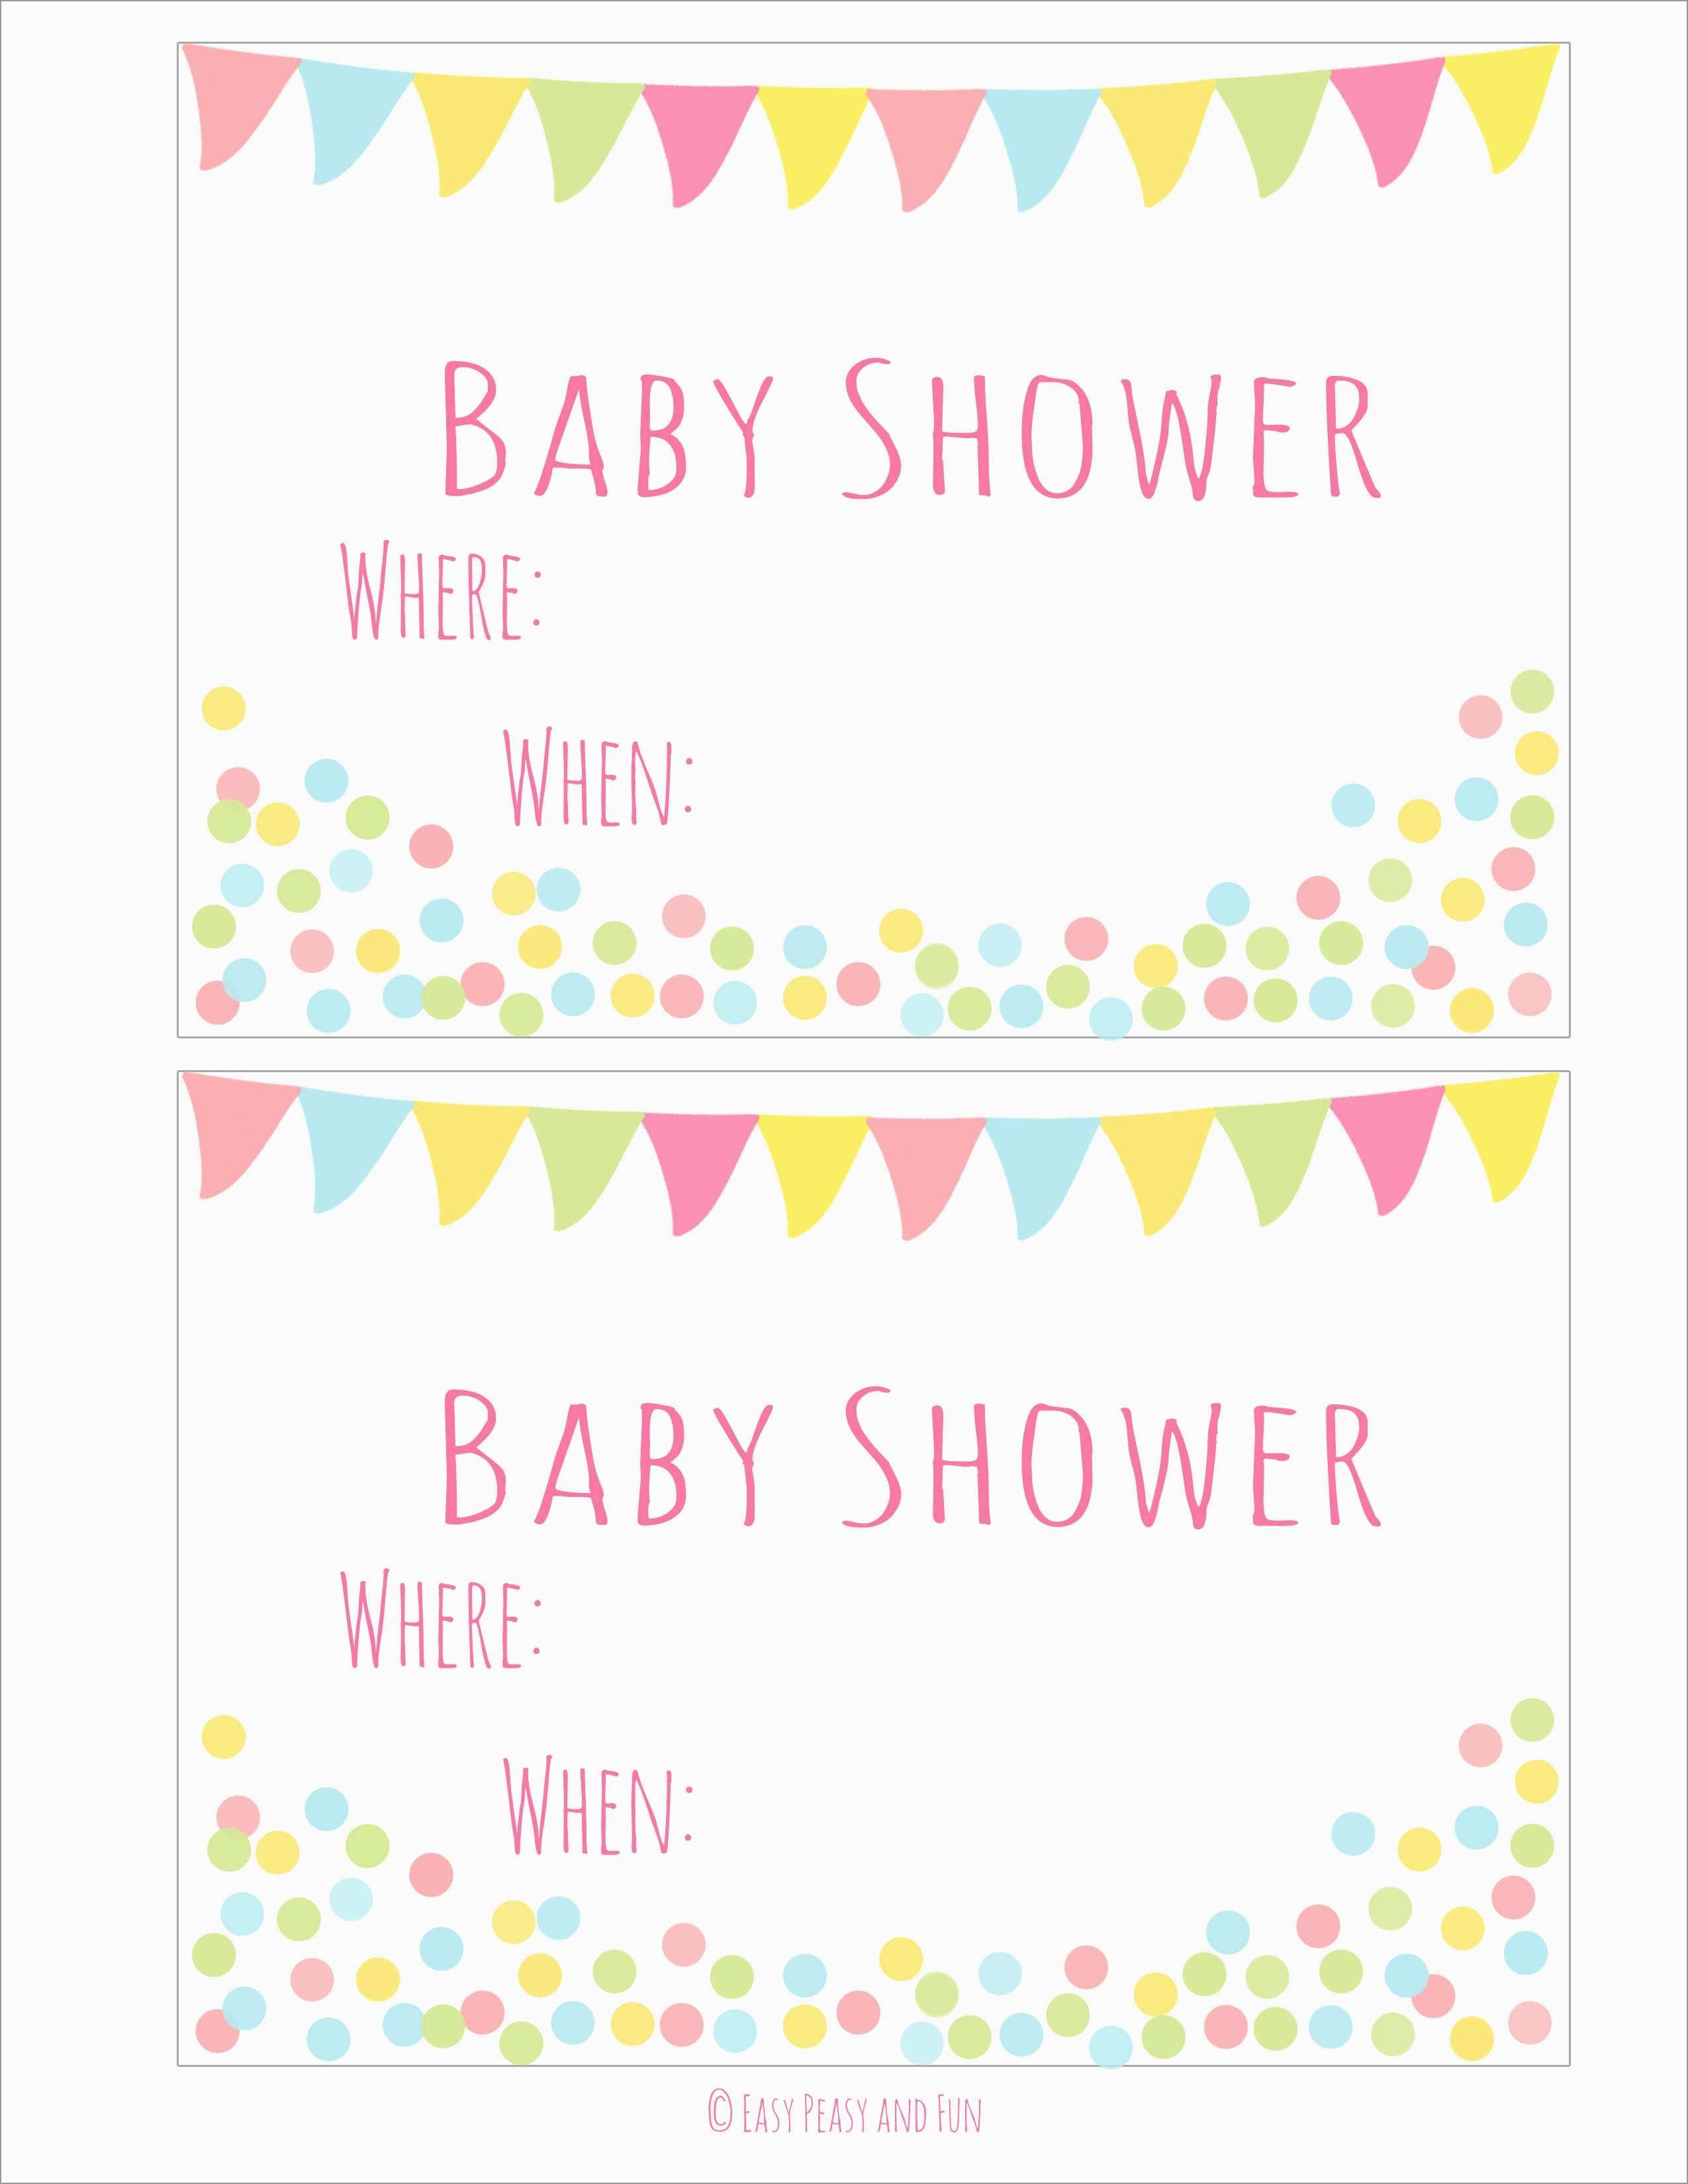 Luxury Free Baby Shower Invitation Templates | Best Of Template - Free Printable Baby Shower Invitation Maker